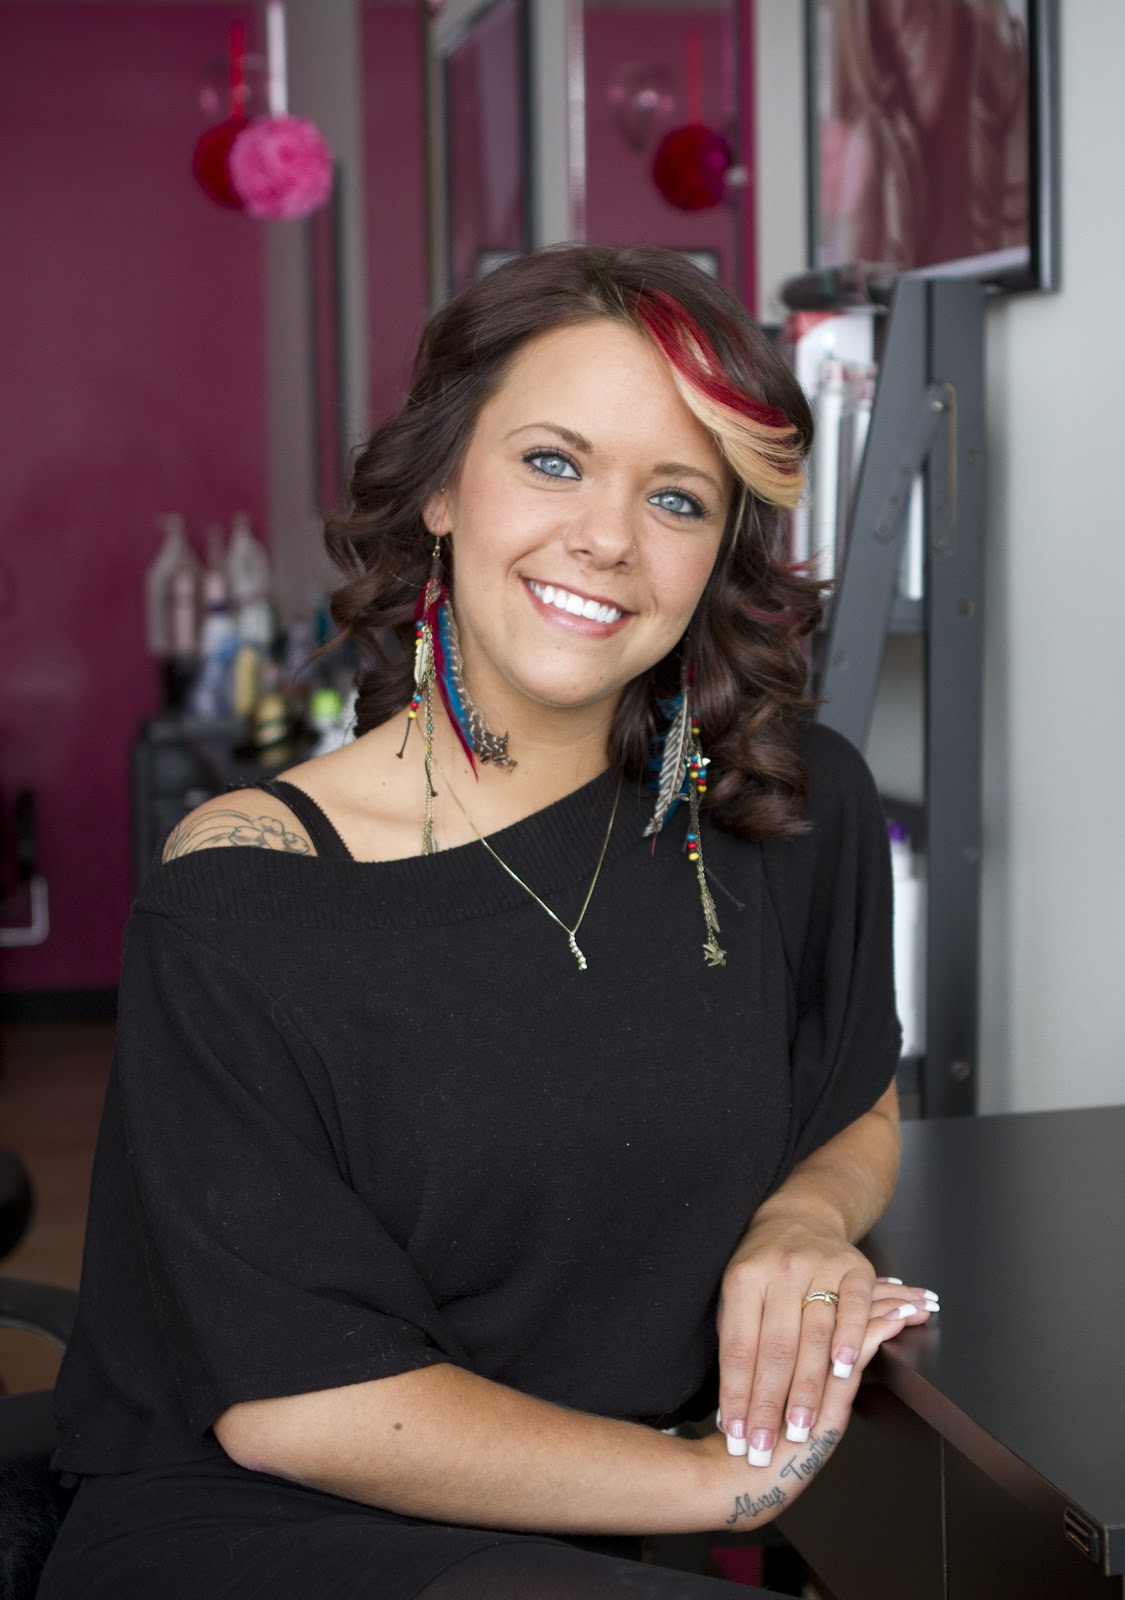 Haley Harned: Pretty Hair Salon Amber